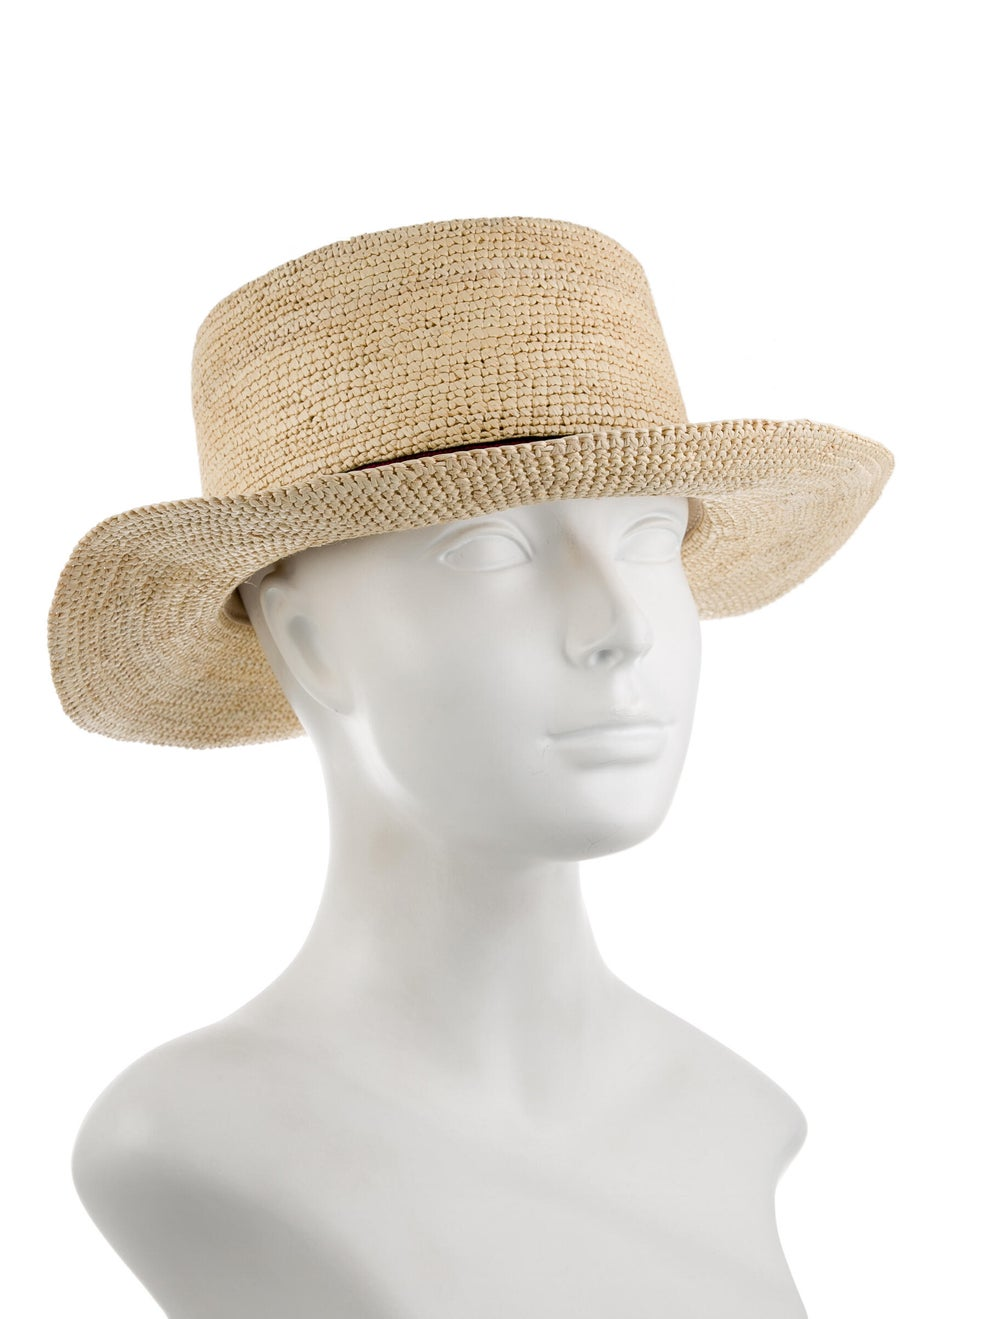 Sensi Studio Straw Wide-Brim Hat Khaki - image 3